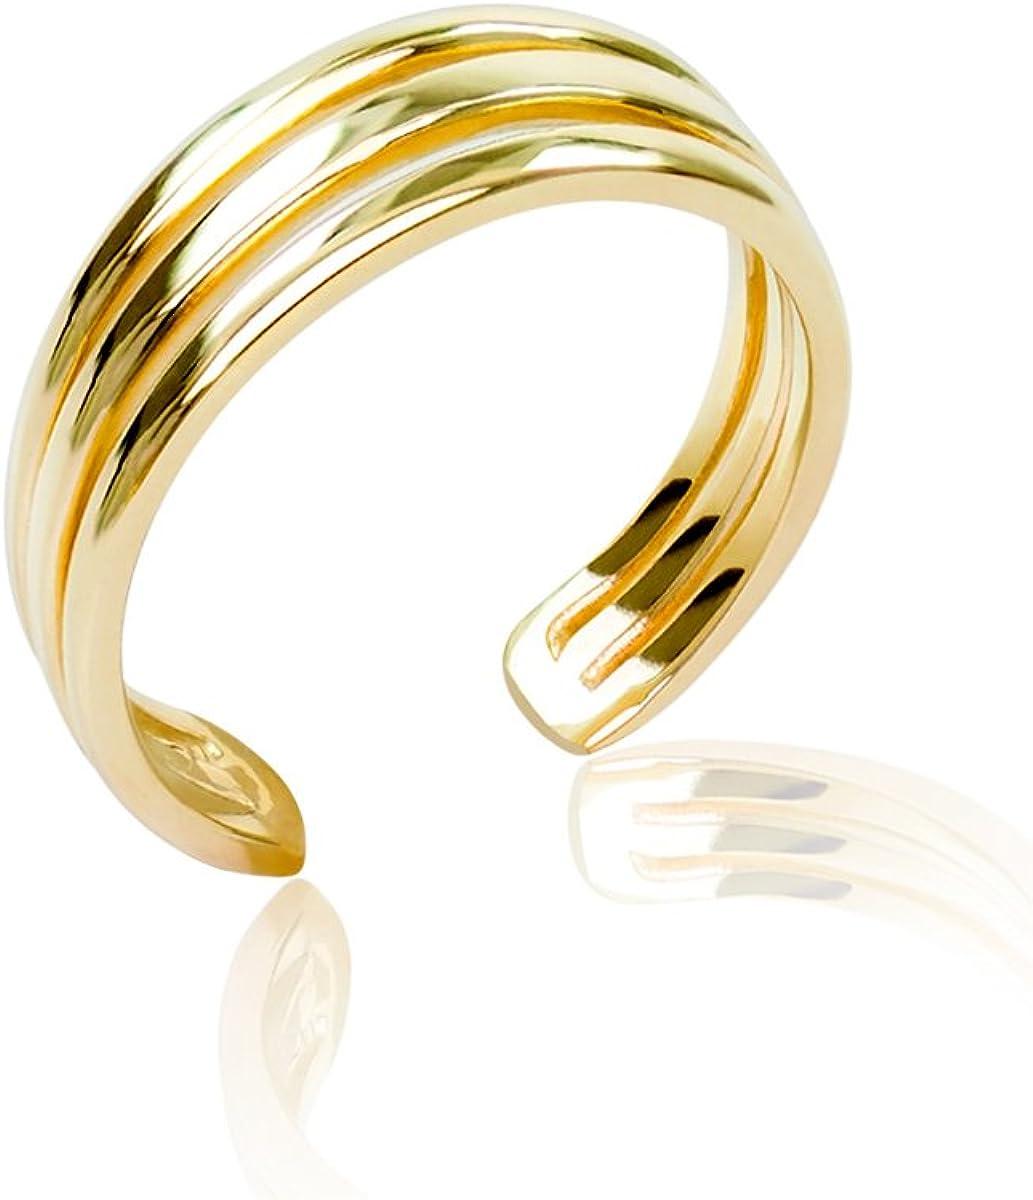 Honolulu Jewelry Company 14K Yellow Gold Three Row Band Toe Ring